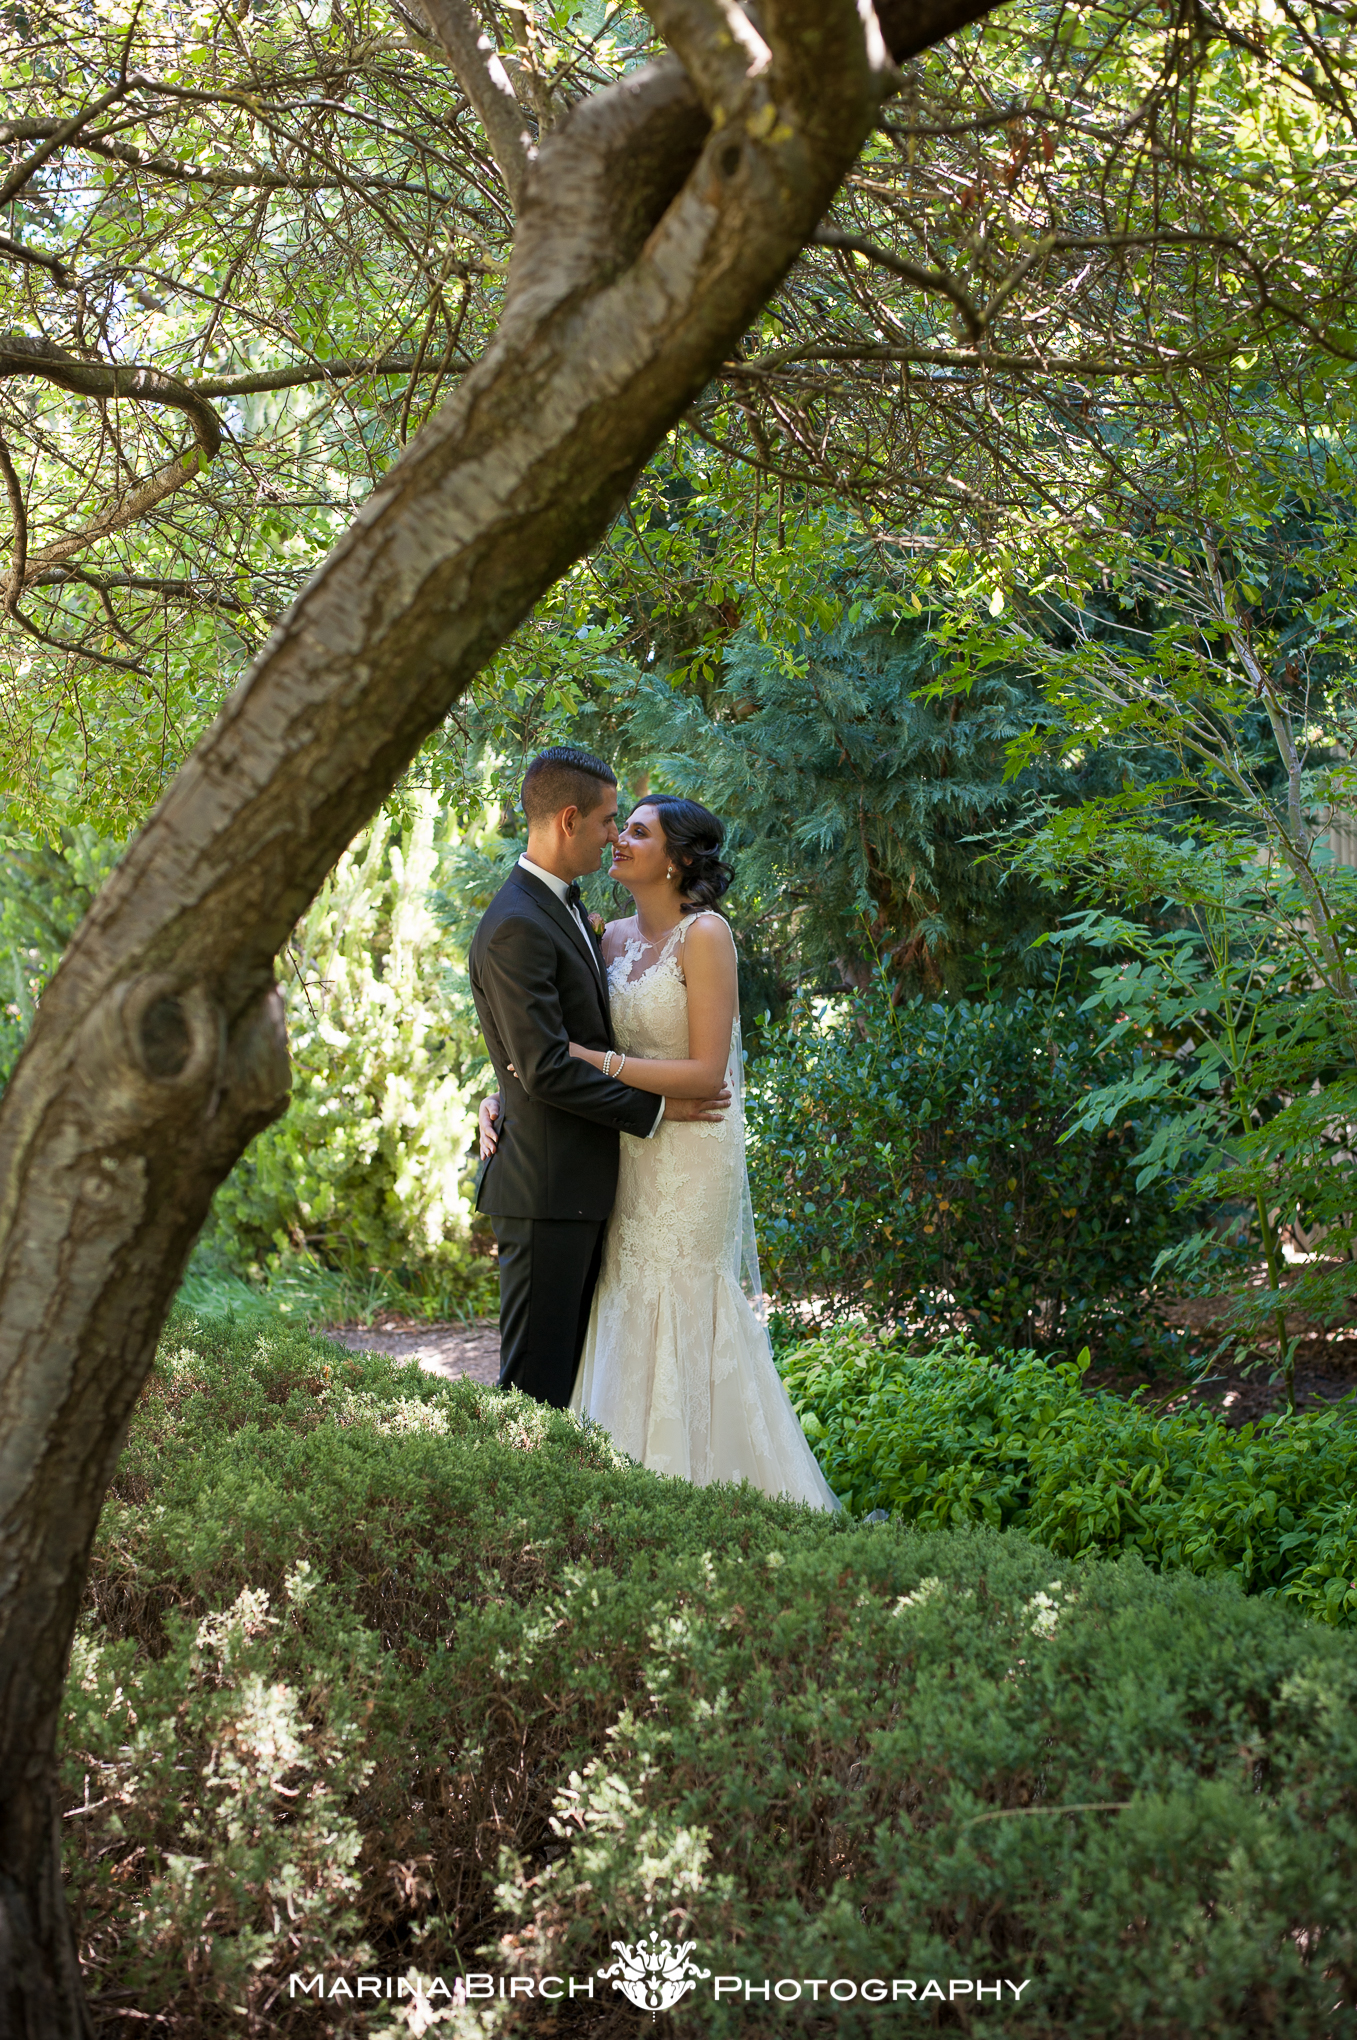 MBP.Lava wedding -22.jpg